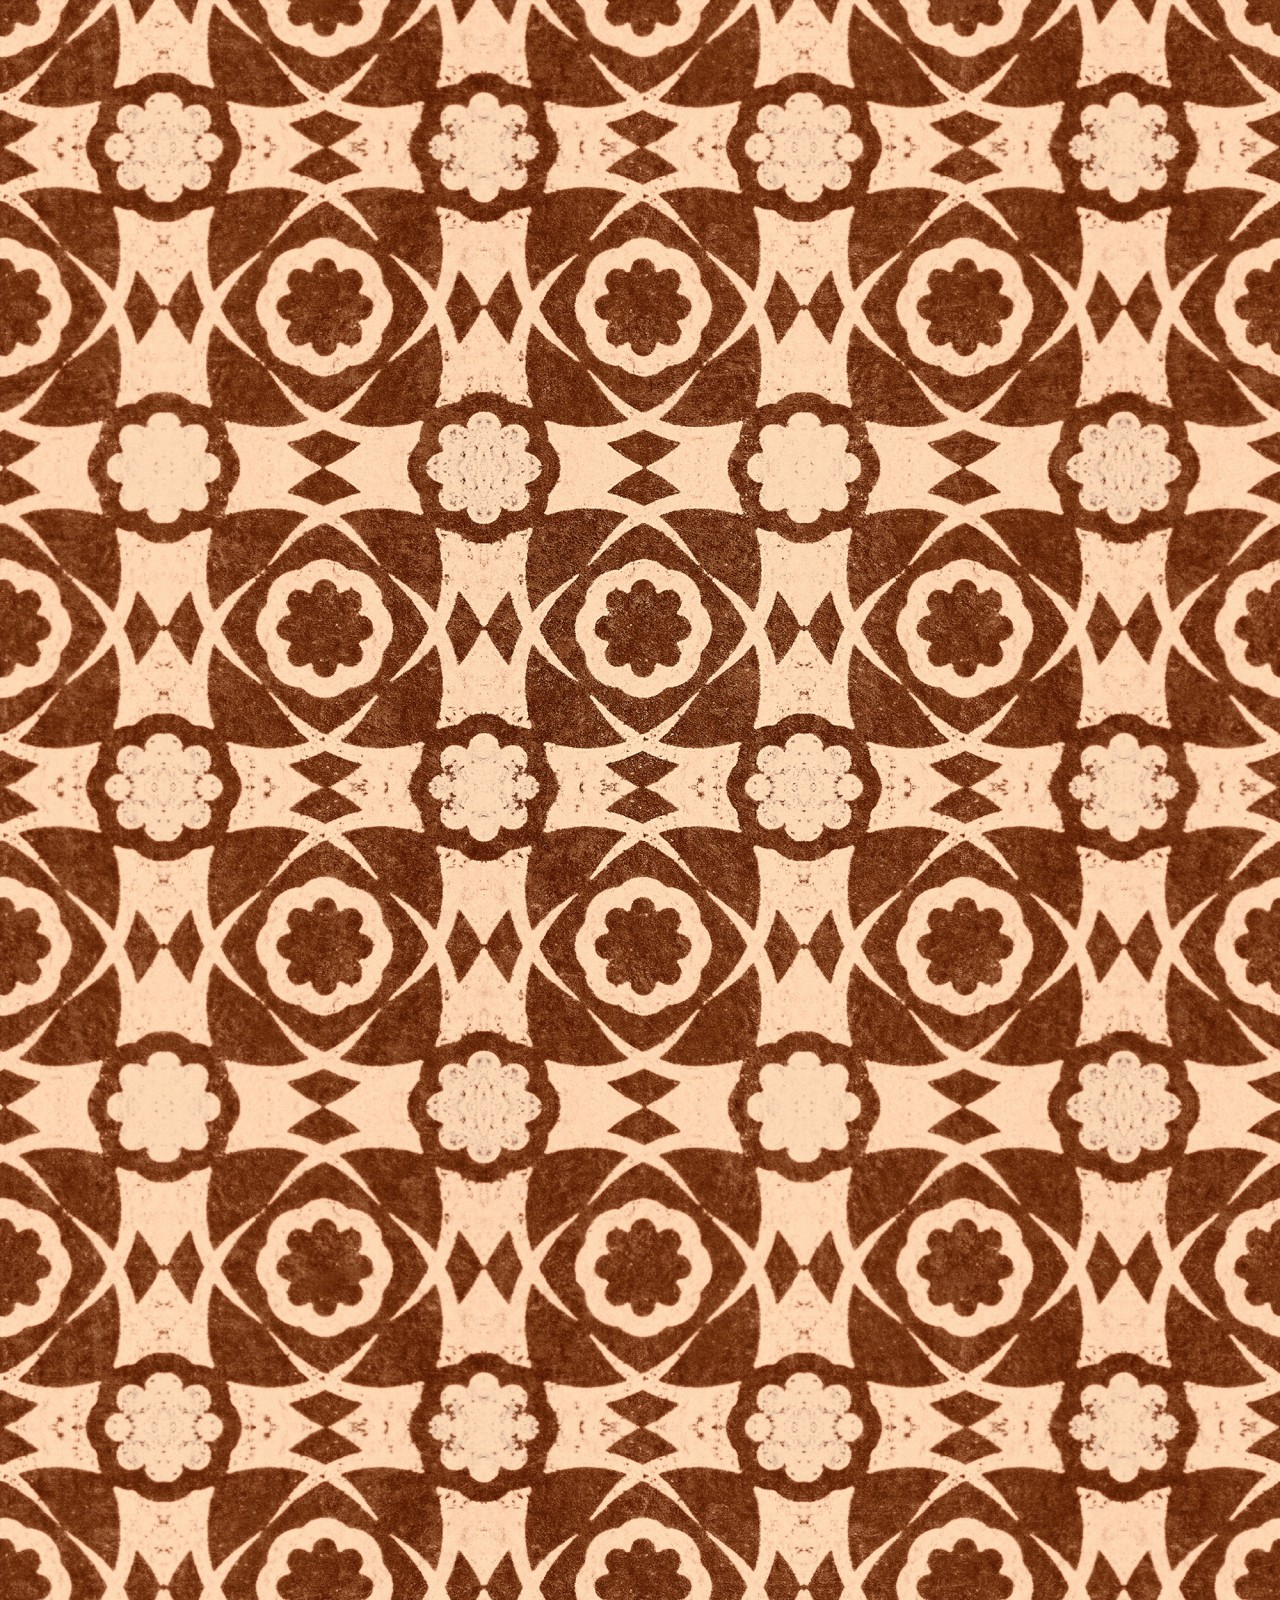 AEGEAN TILES Leather Wallpaper